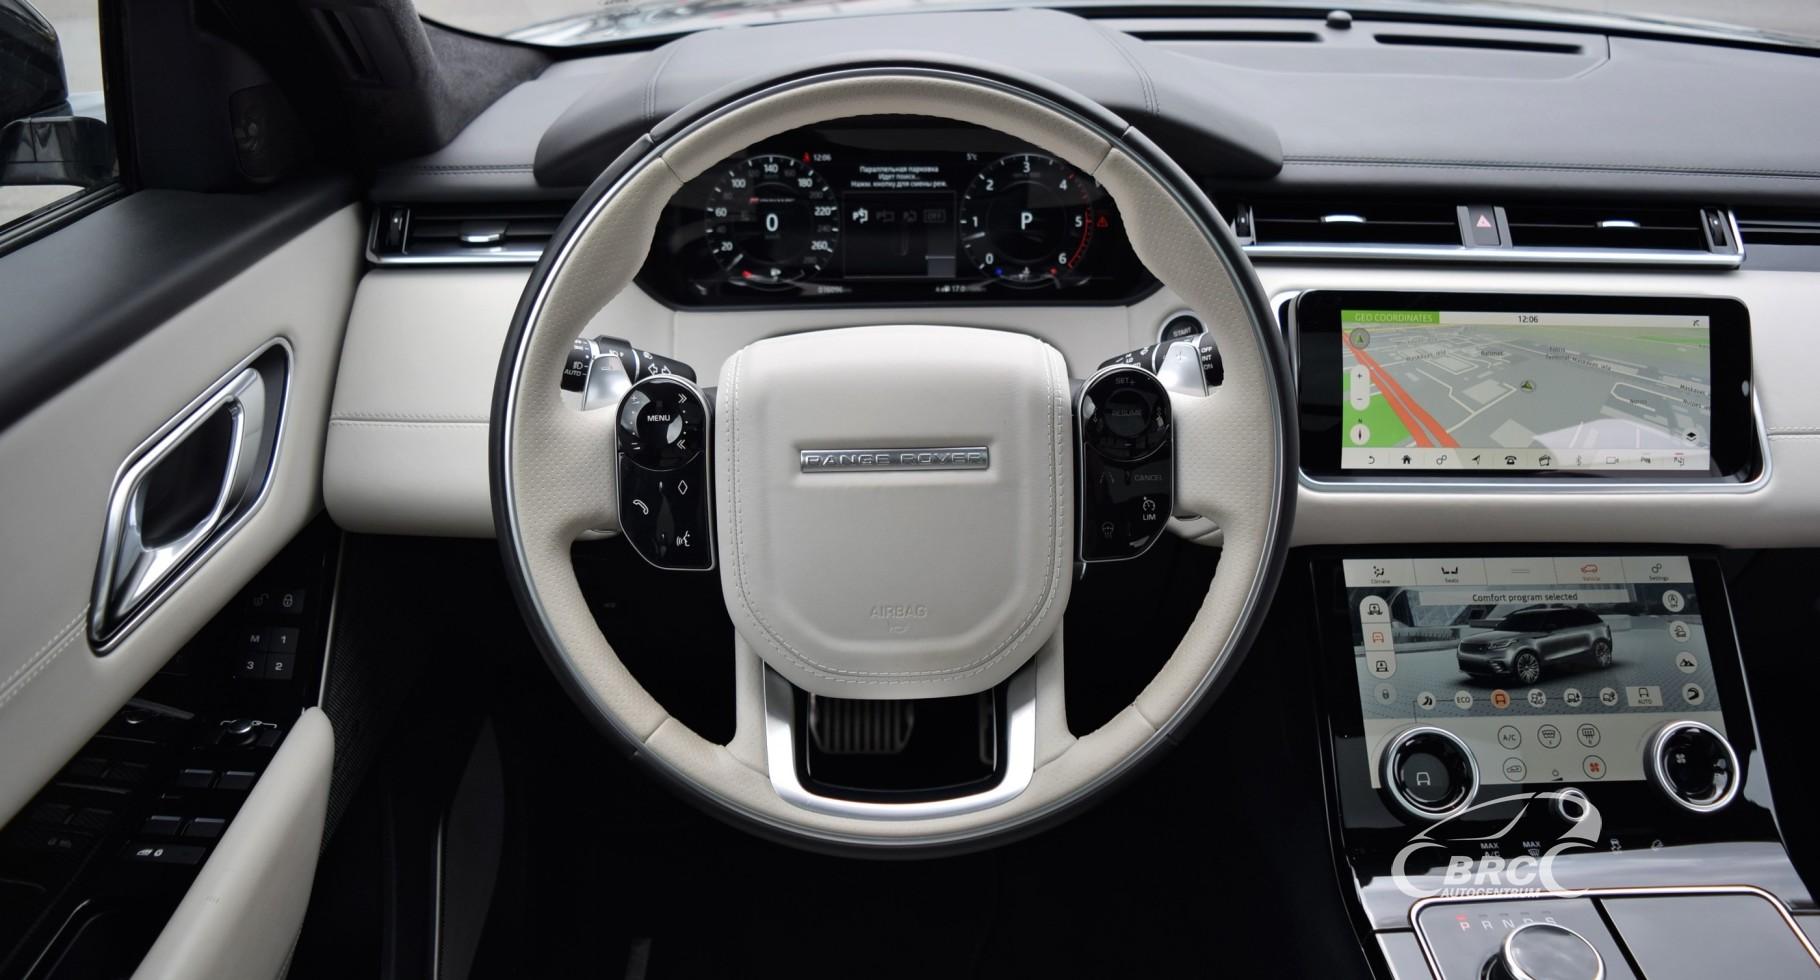 Land-Rover Range Rover Velar R Dynamic D300 HSE First Edition